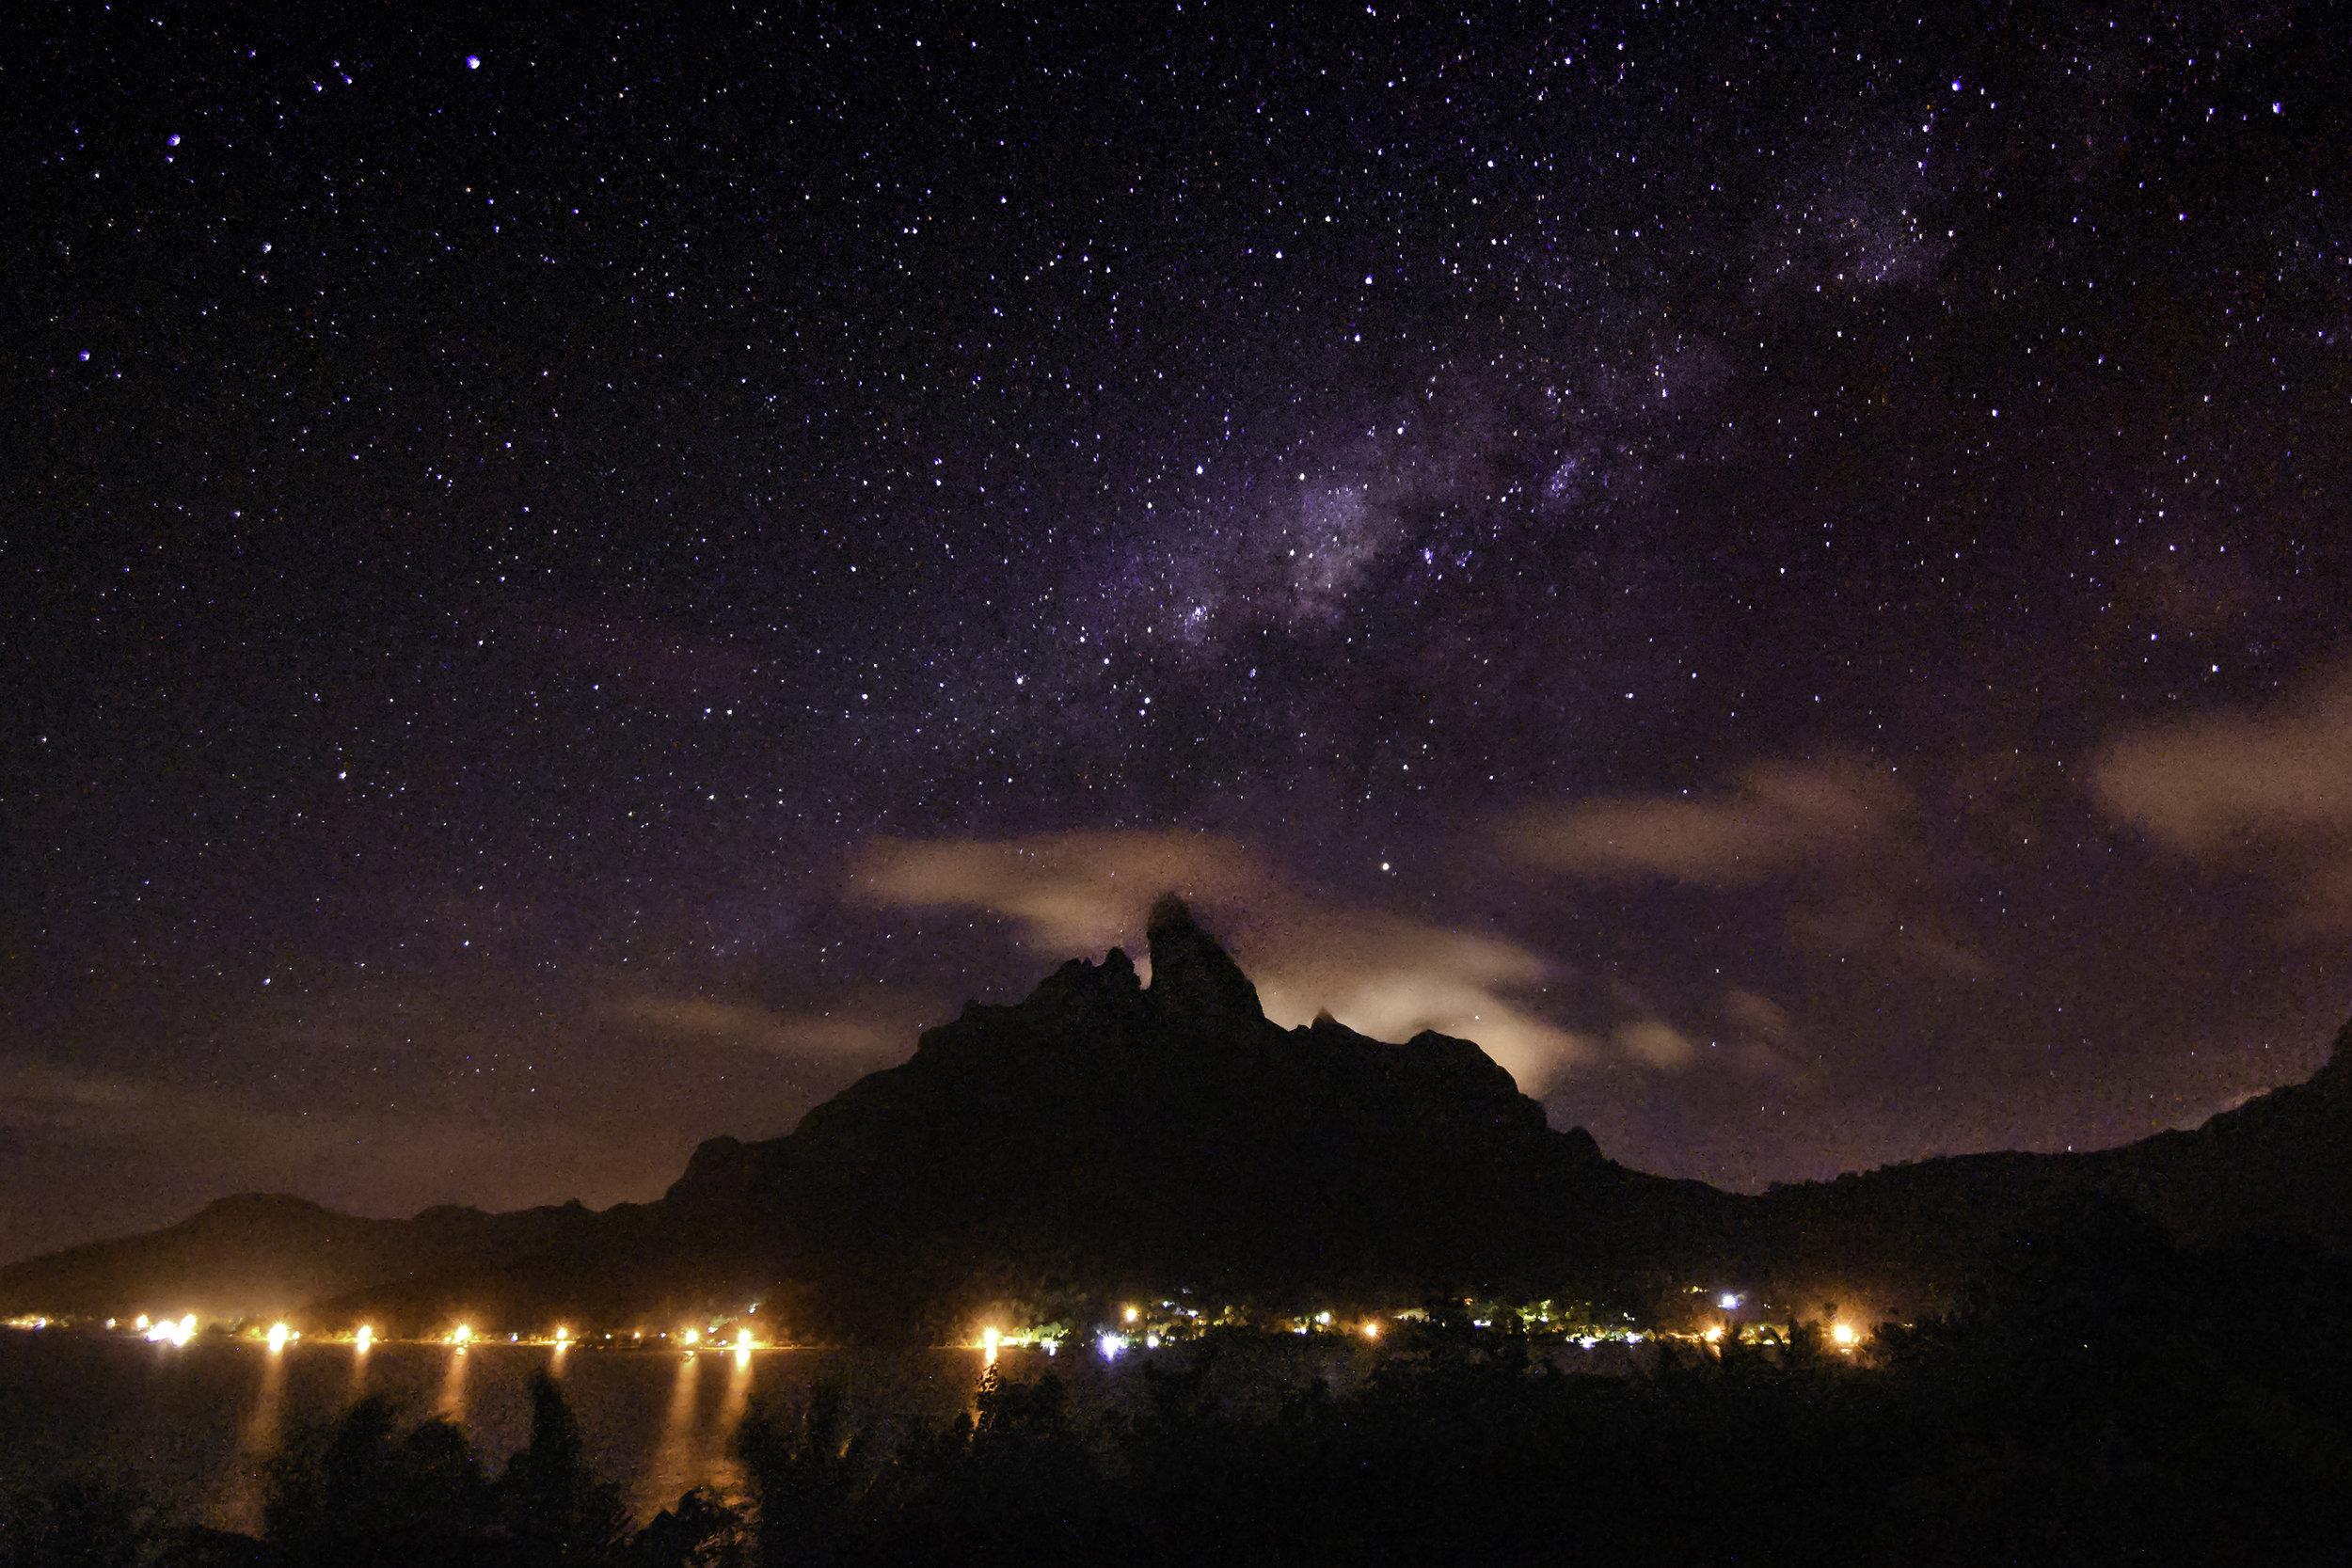 Bora Bora by Starlight / Jeremiah Cunningham